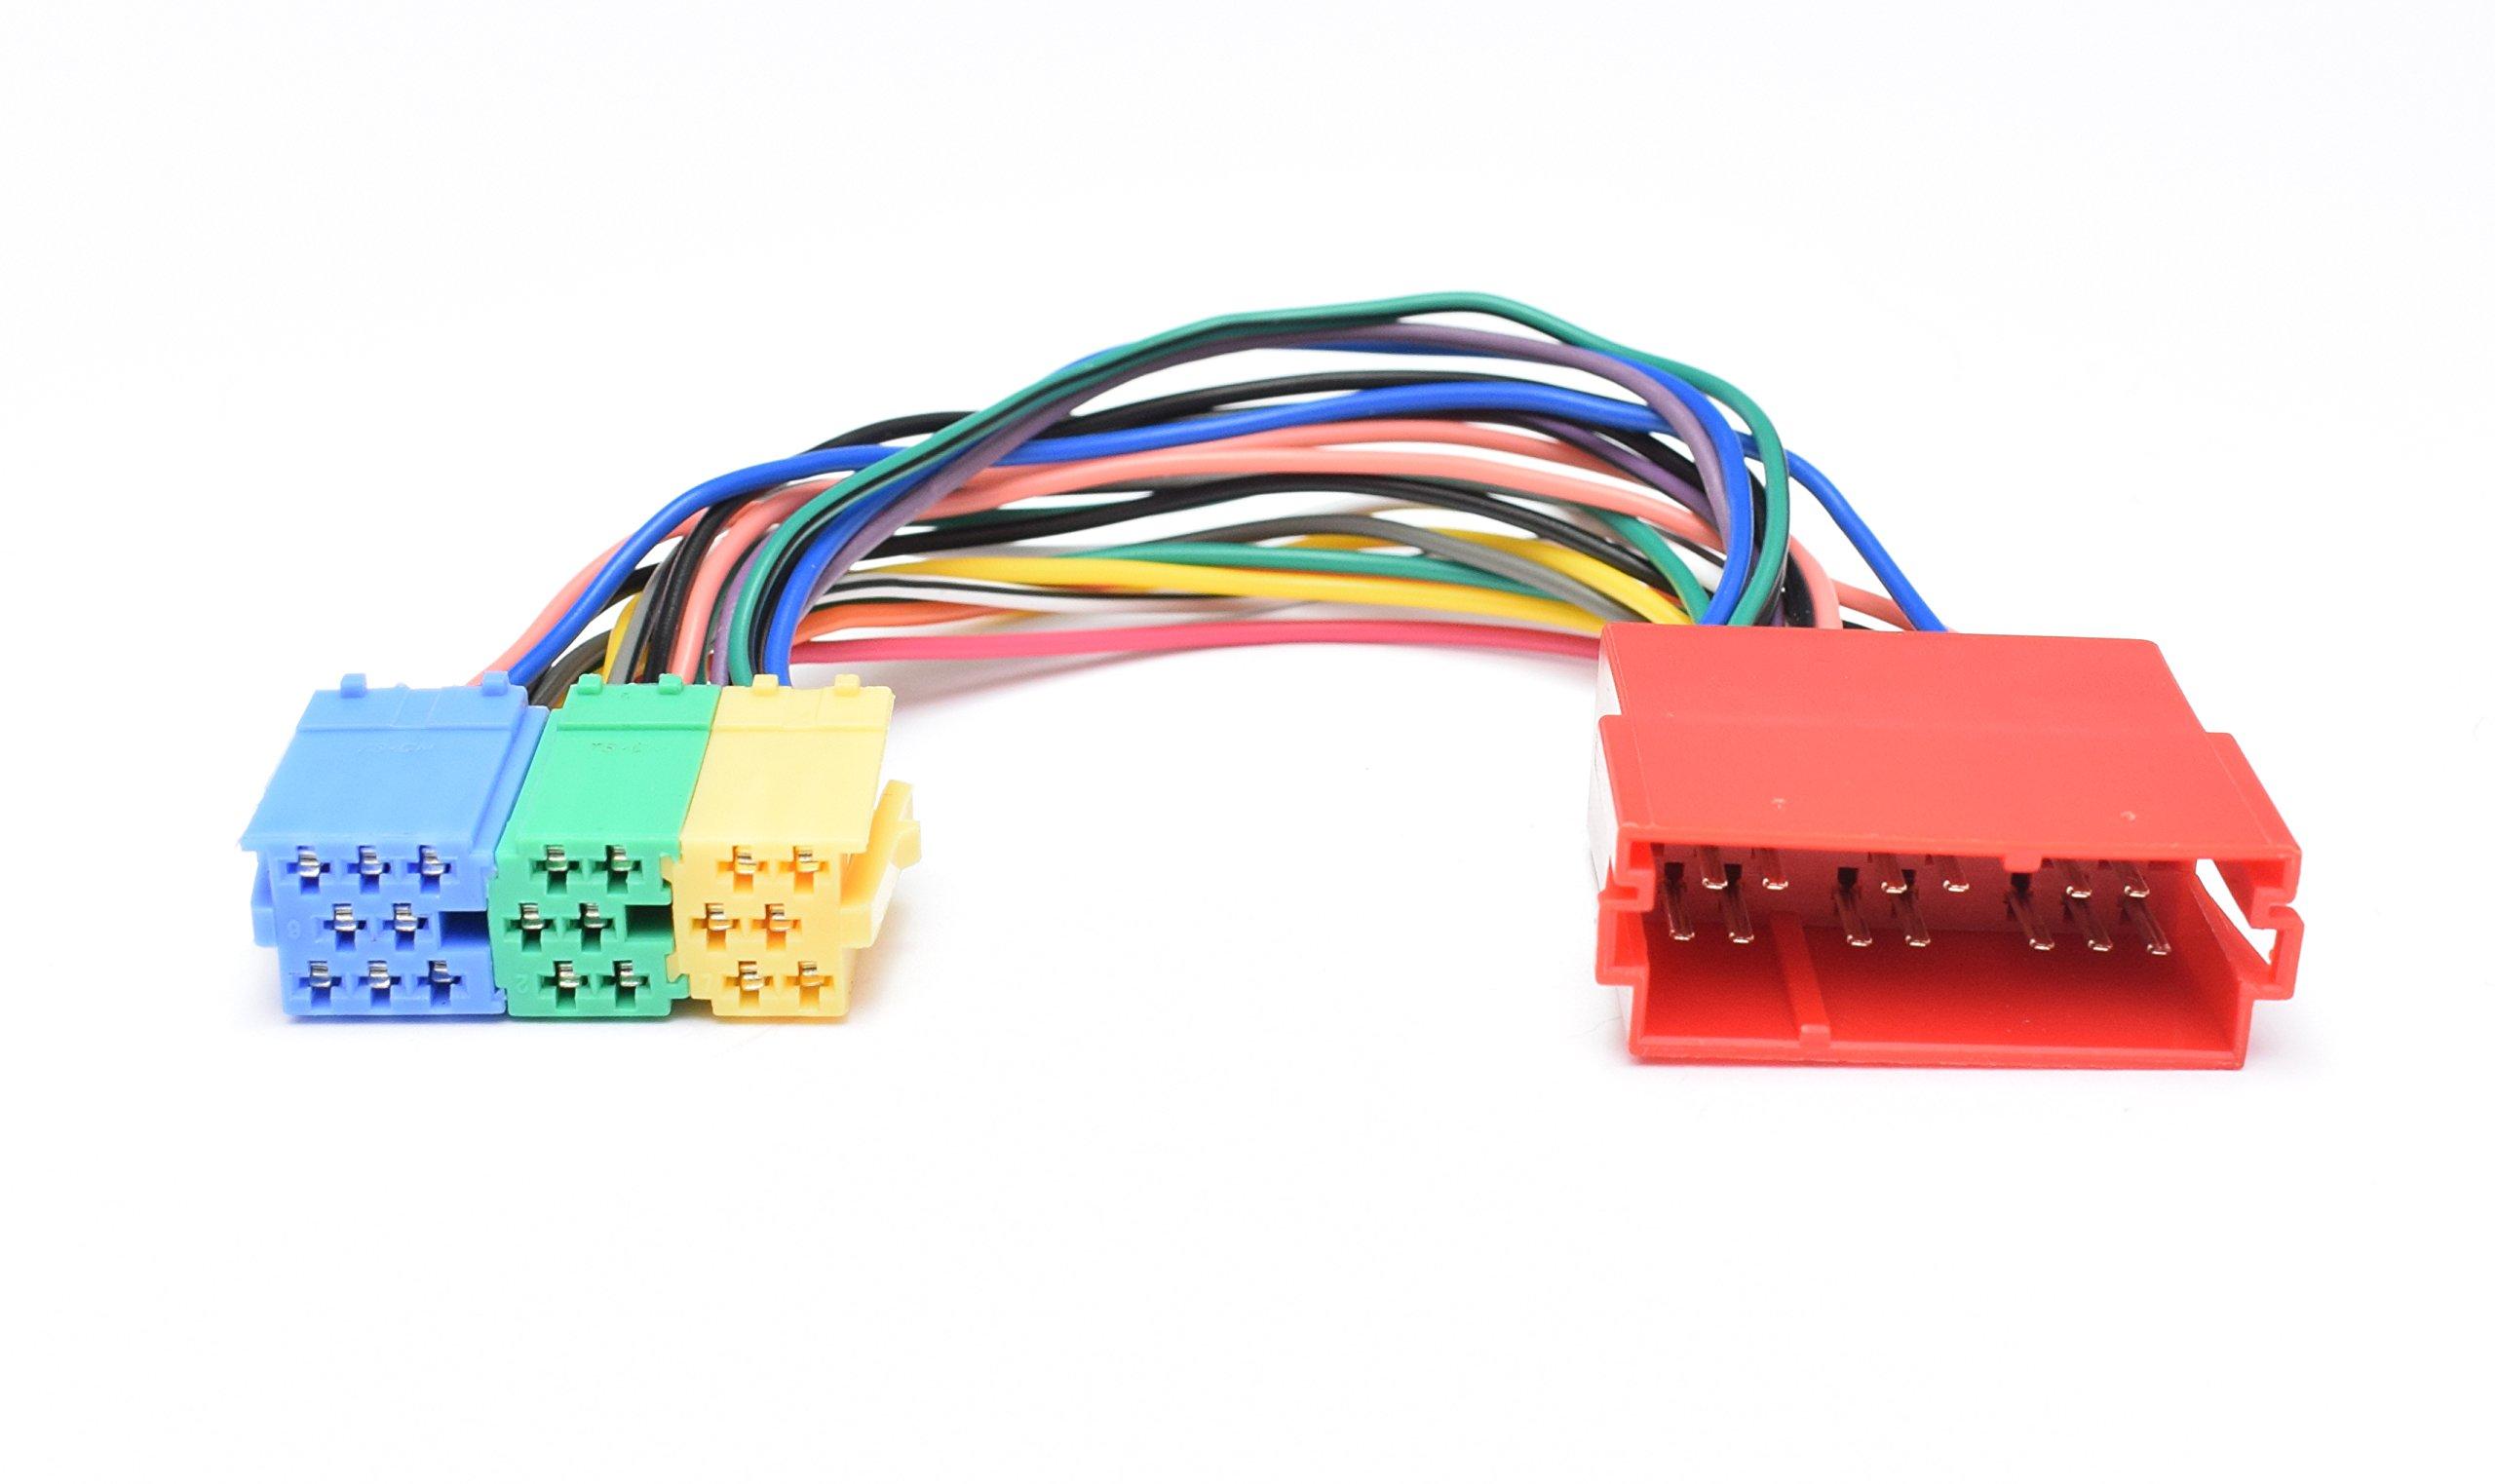 Bluetooth-Audio-Interface-geeignet-fr-8pin-Mini-ISO-Audi-Chorus-2-Concert-2Symphony-12-Navigation-Plus-12-RNS-D-VW-MCD-MFD-Gamma-5